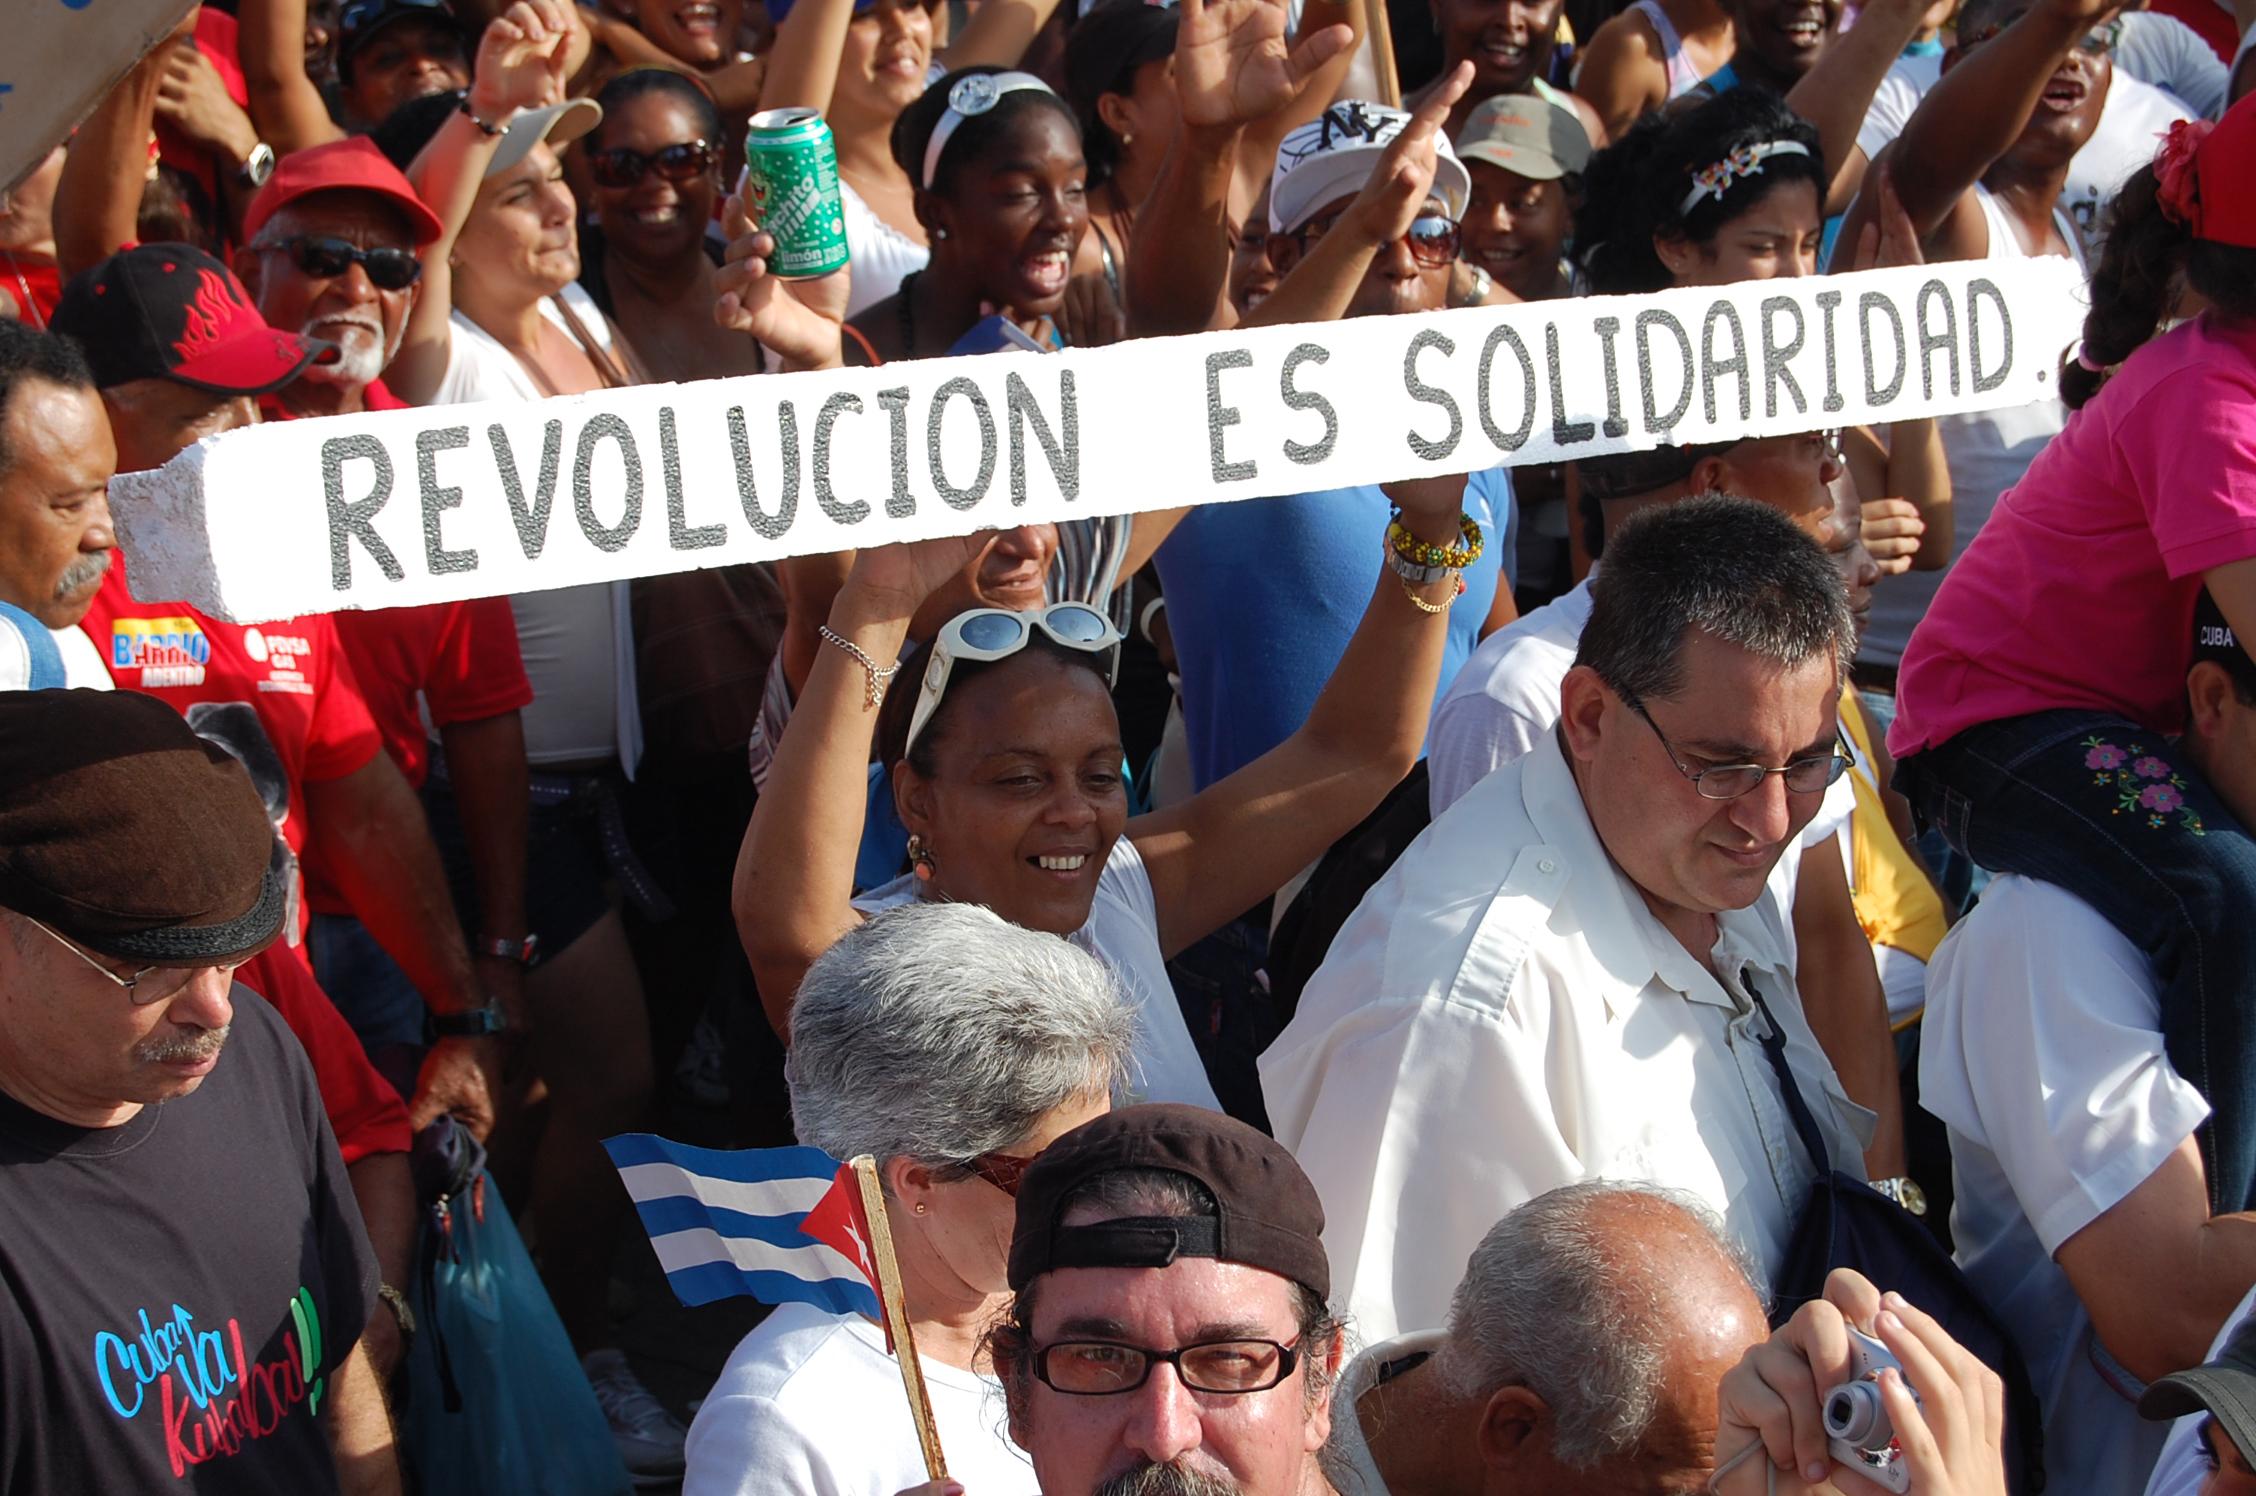 revolucion_color.jpg